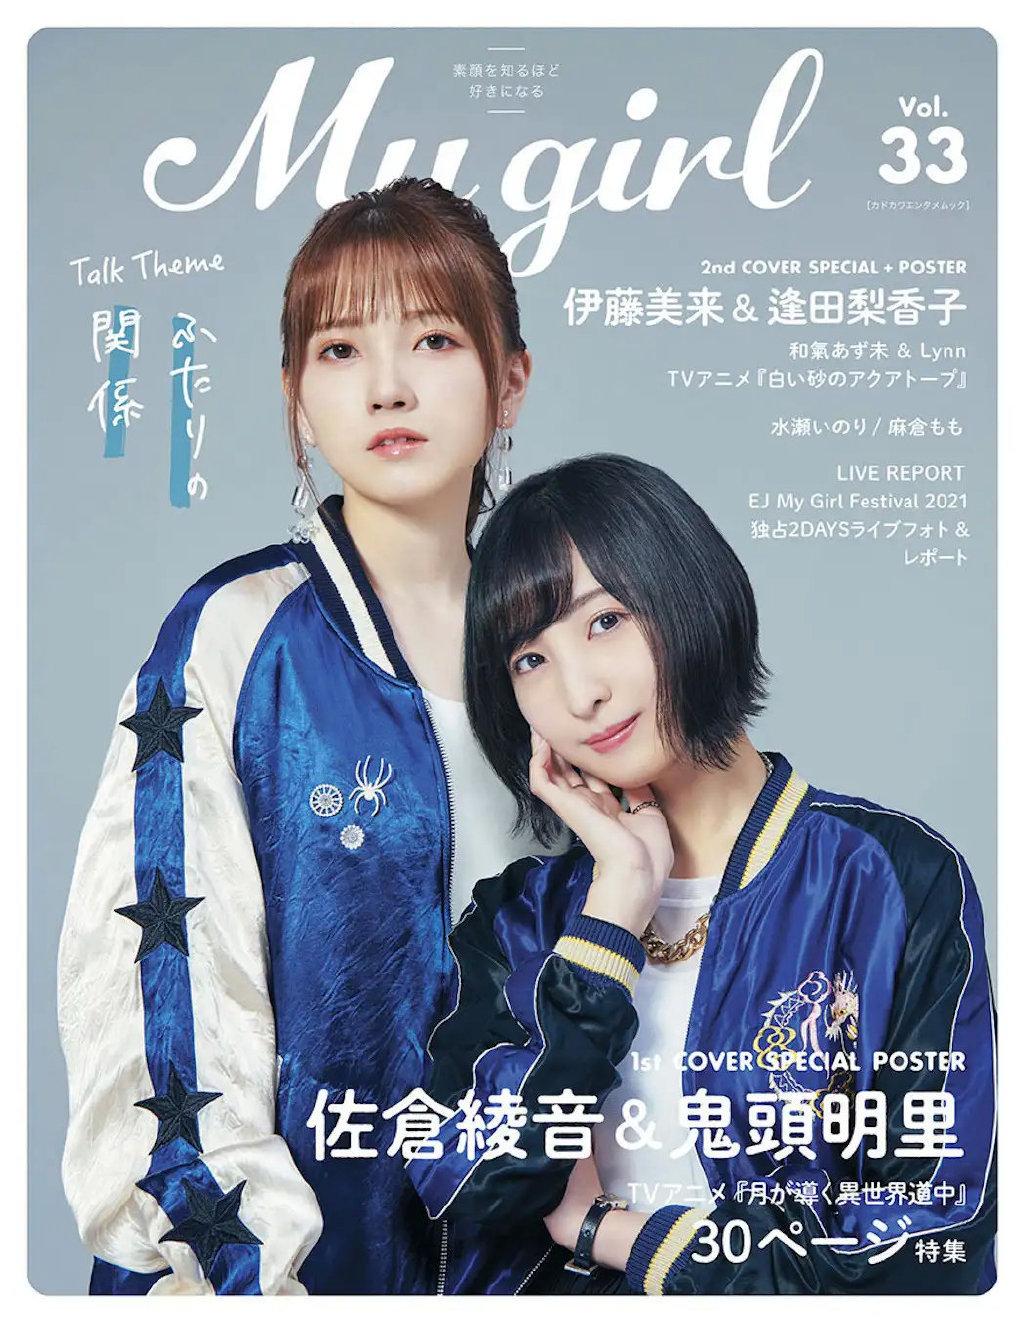 鬼头明里 週刊プレイボーイ No.30 封面+特集  声优 写真集 第12张